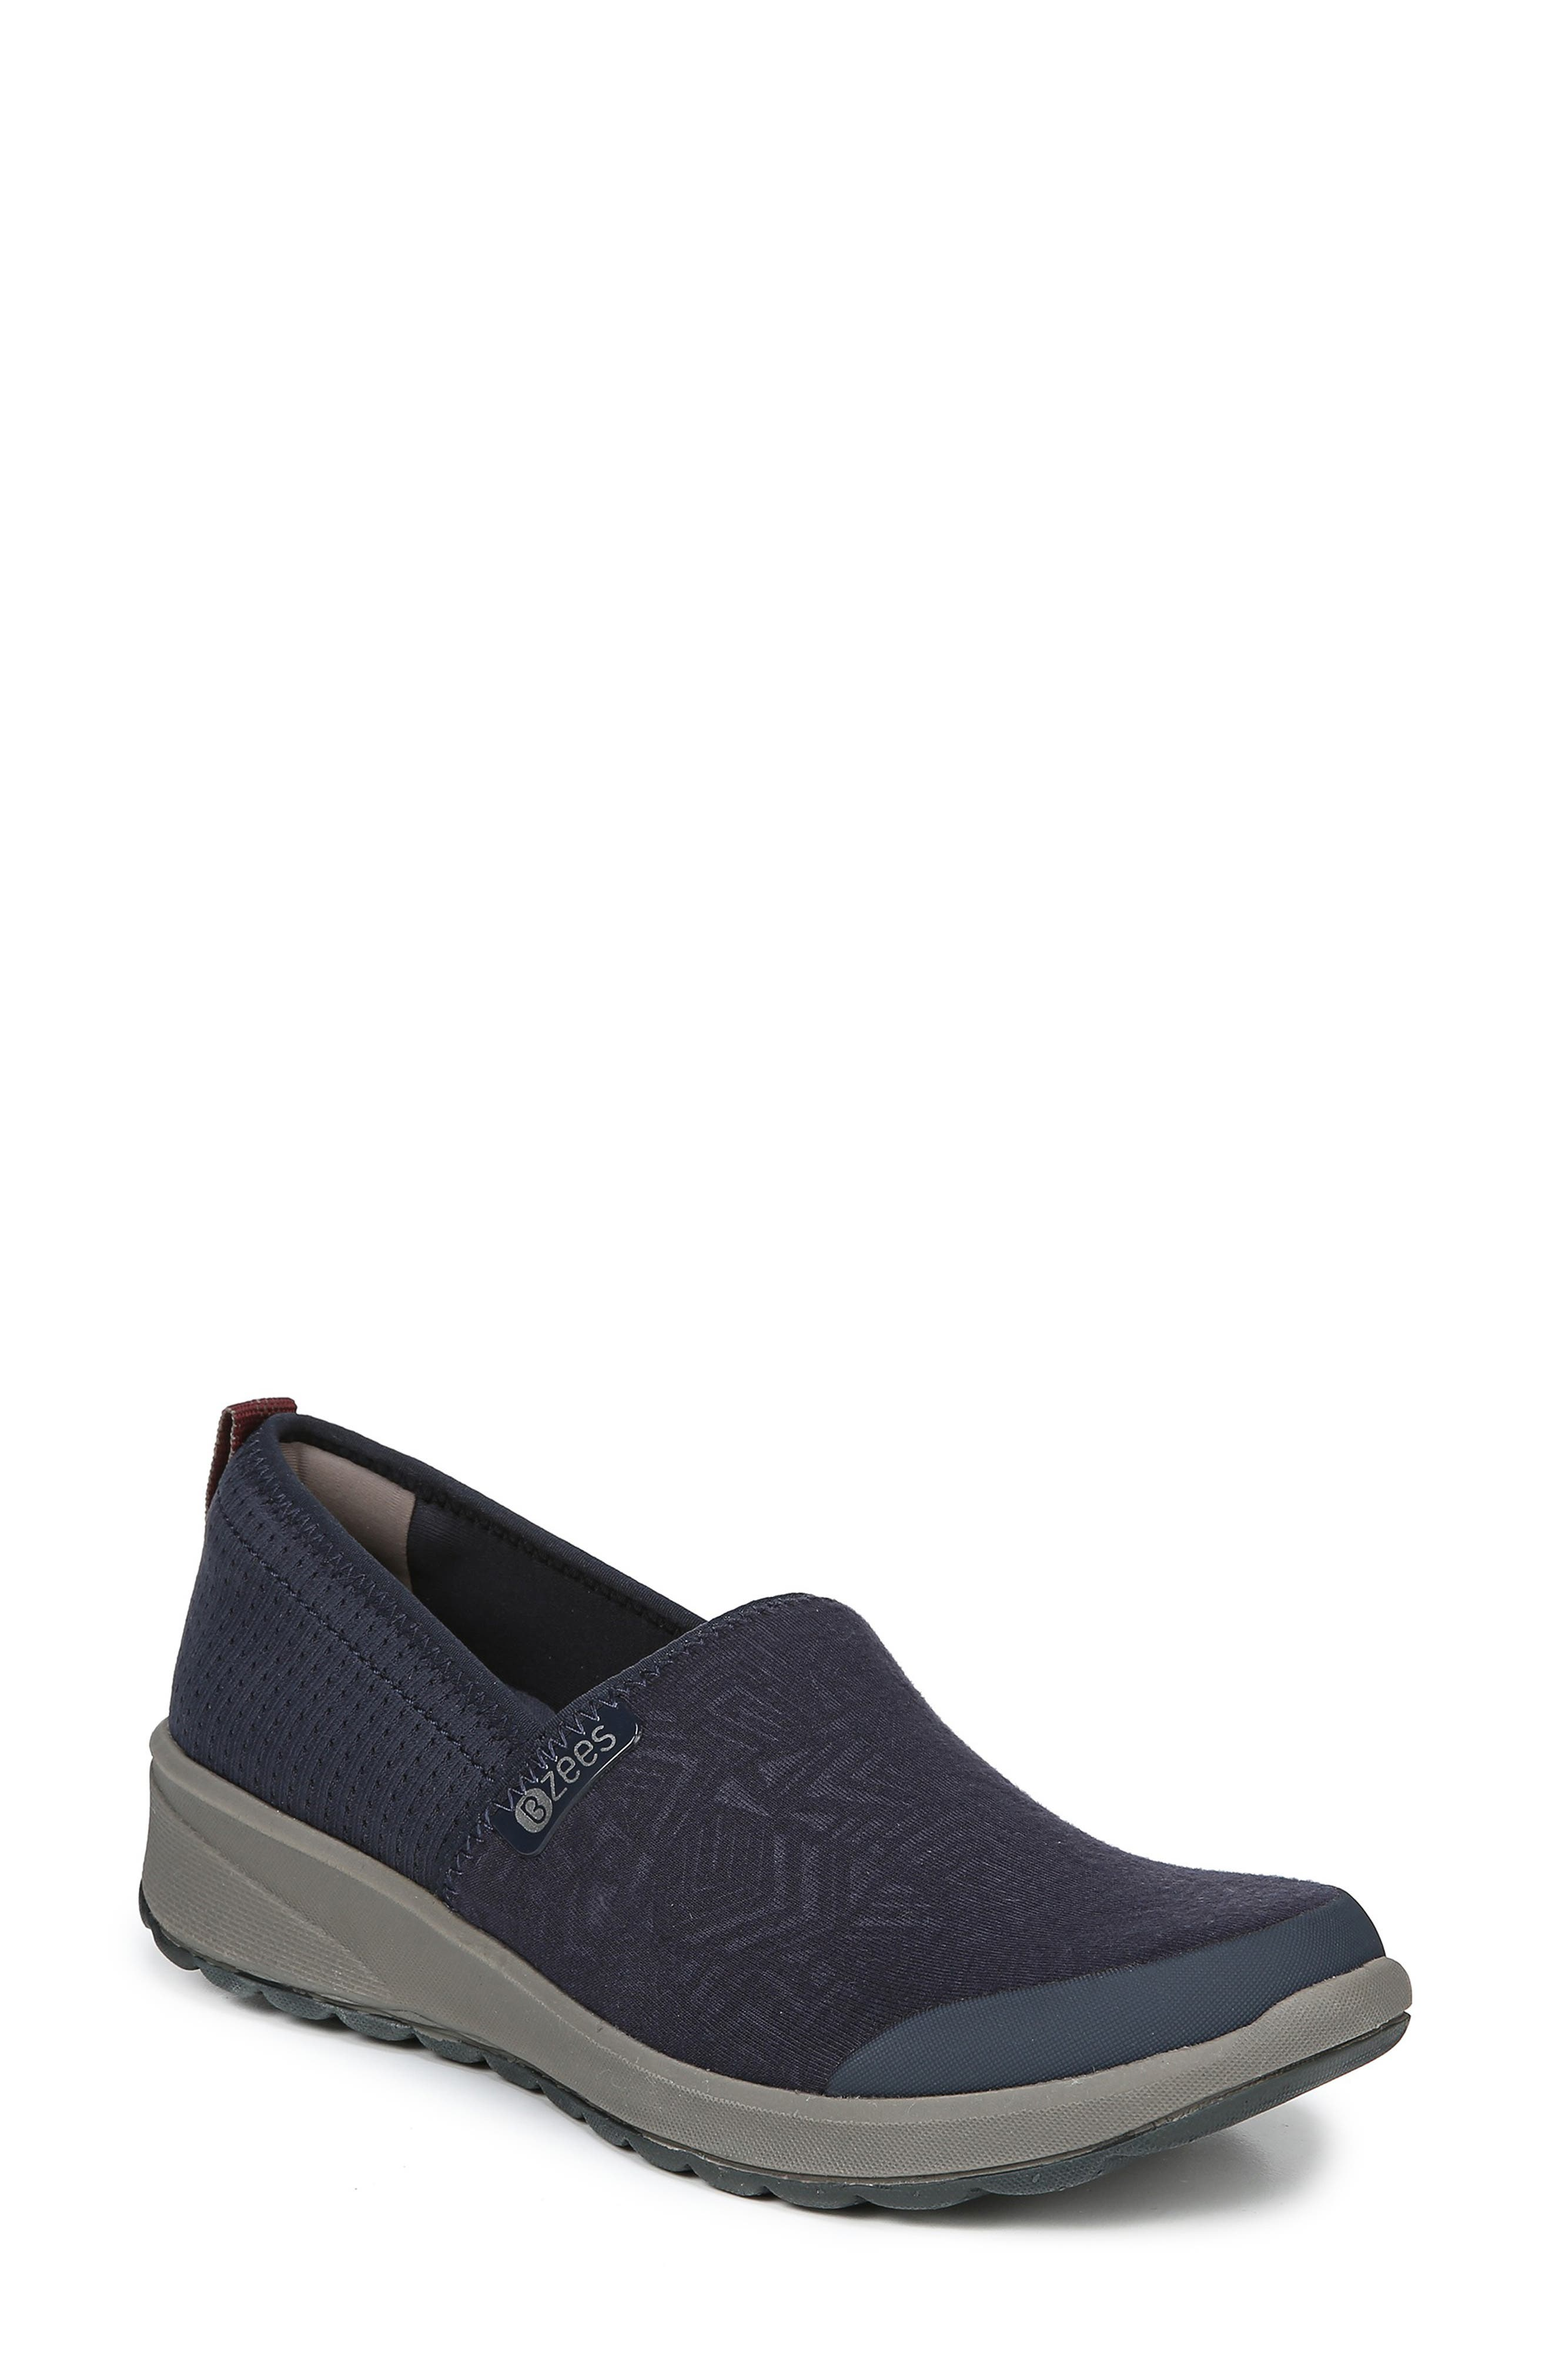 Glee Slip-On Sneaker,                         Main,                         color, NAVY GEO FABRIC